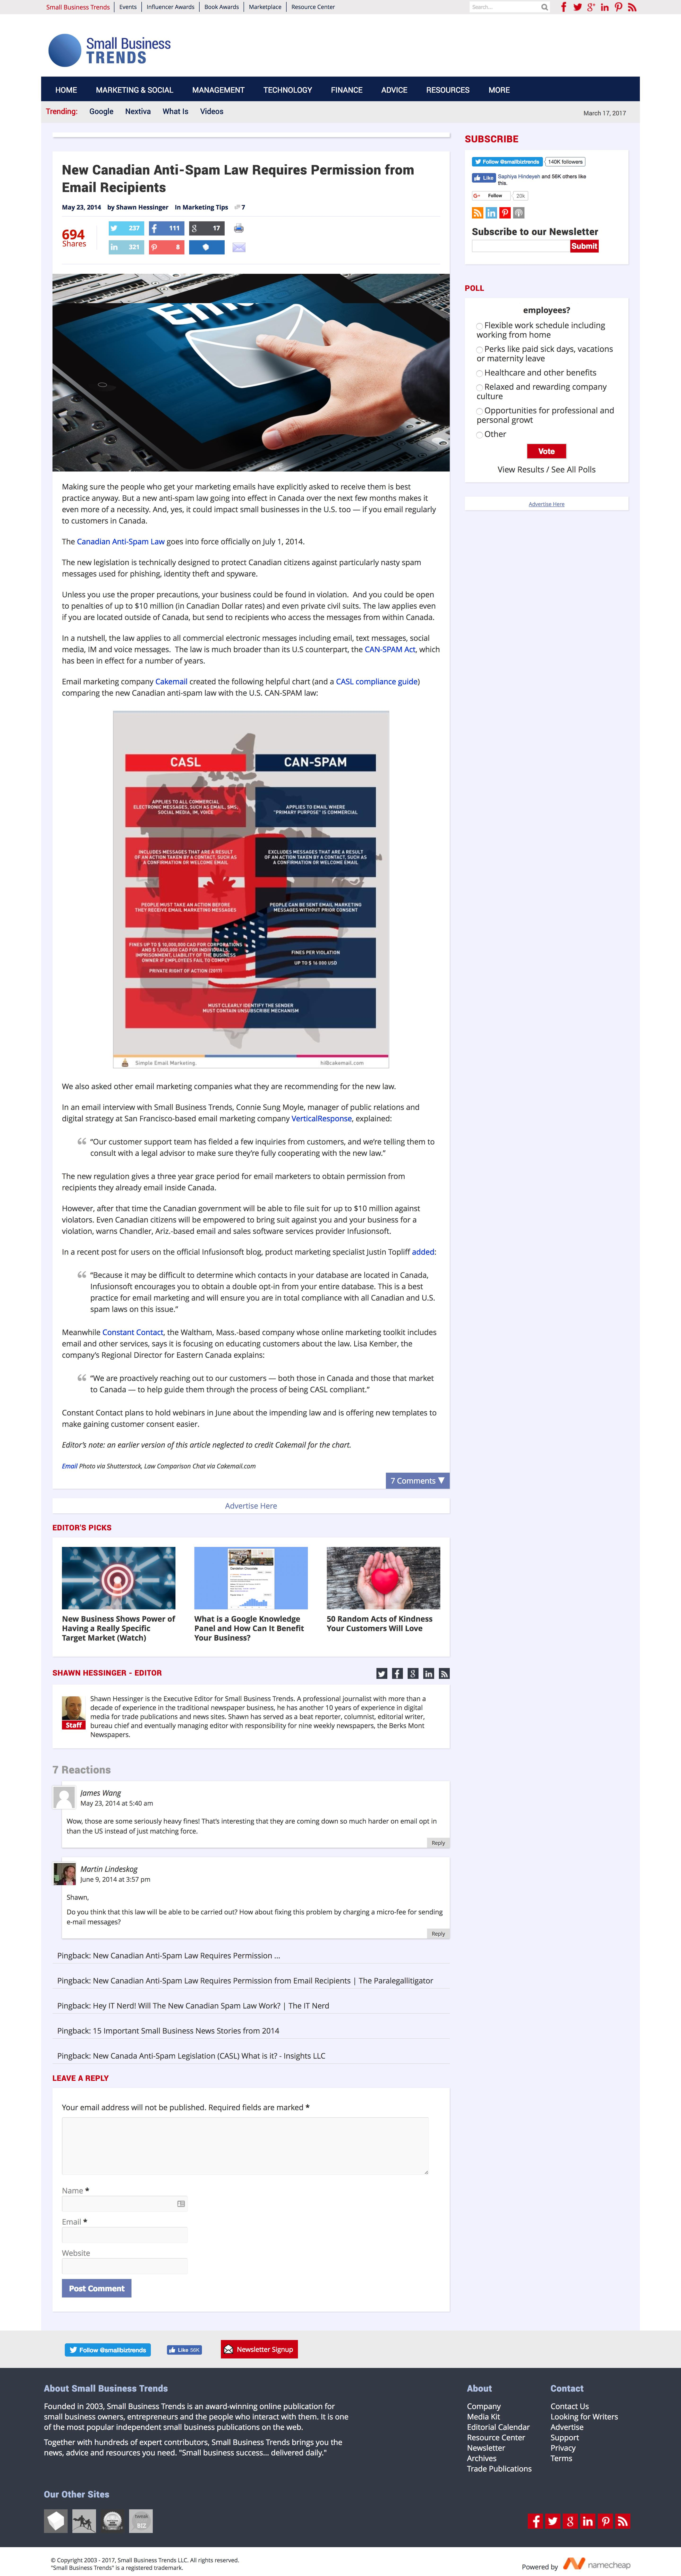 Justin Topliff SmallBizTrends CASL article